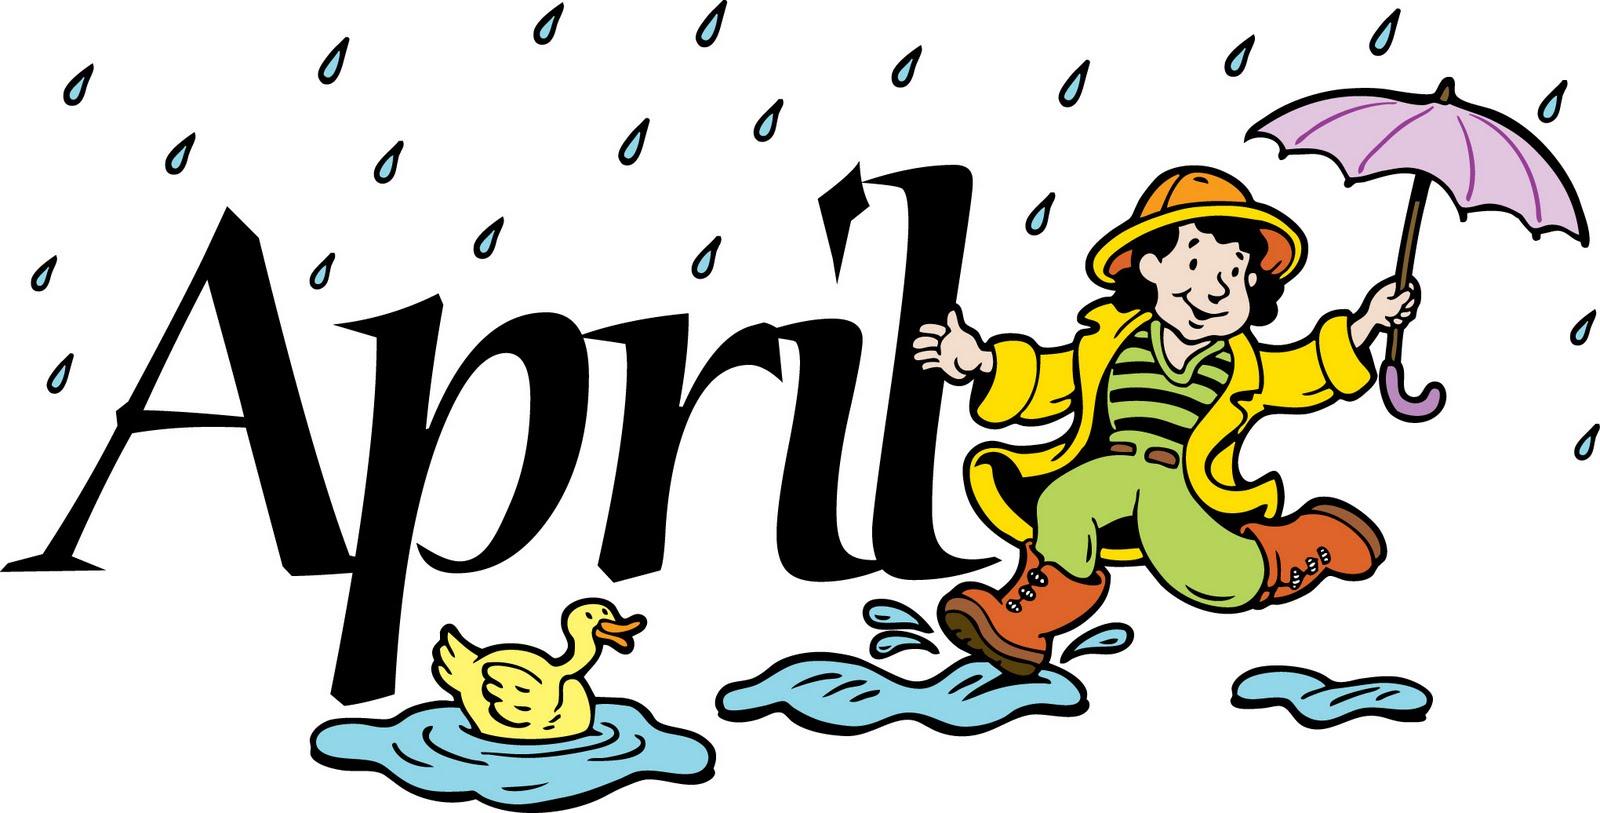 1600x813 Free Month Of April Clip Art Clipart Image